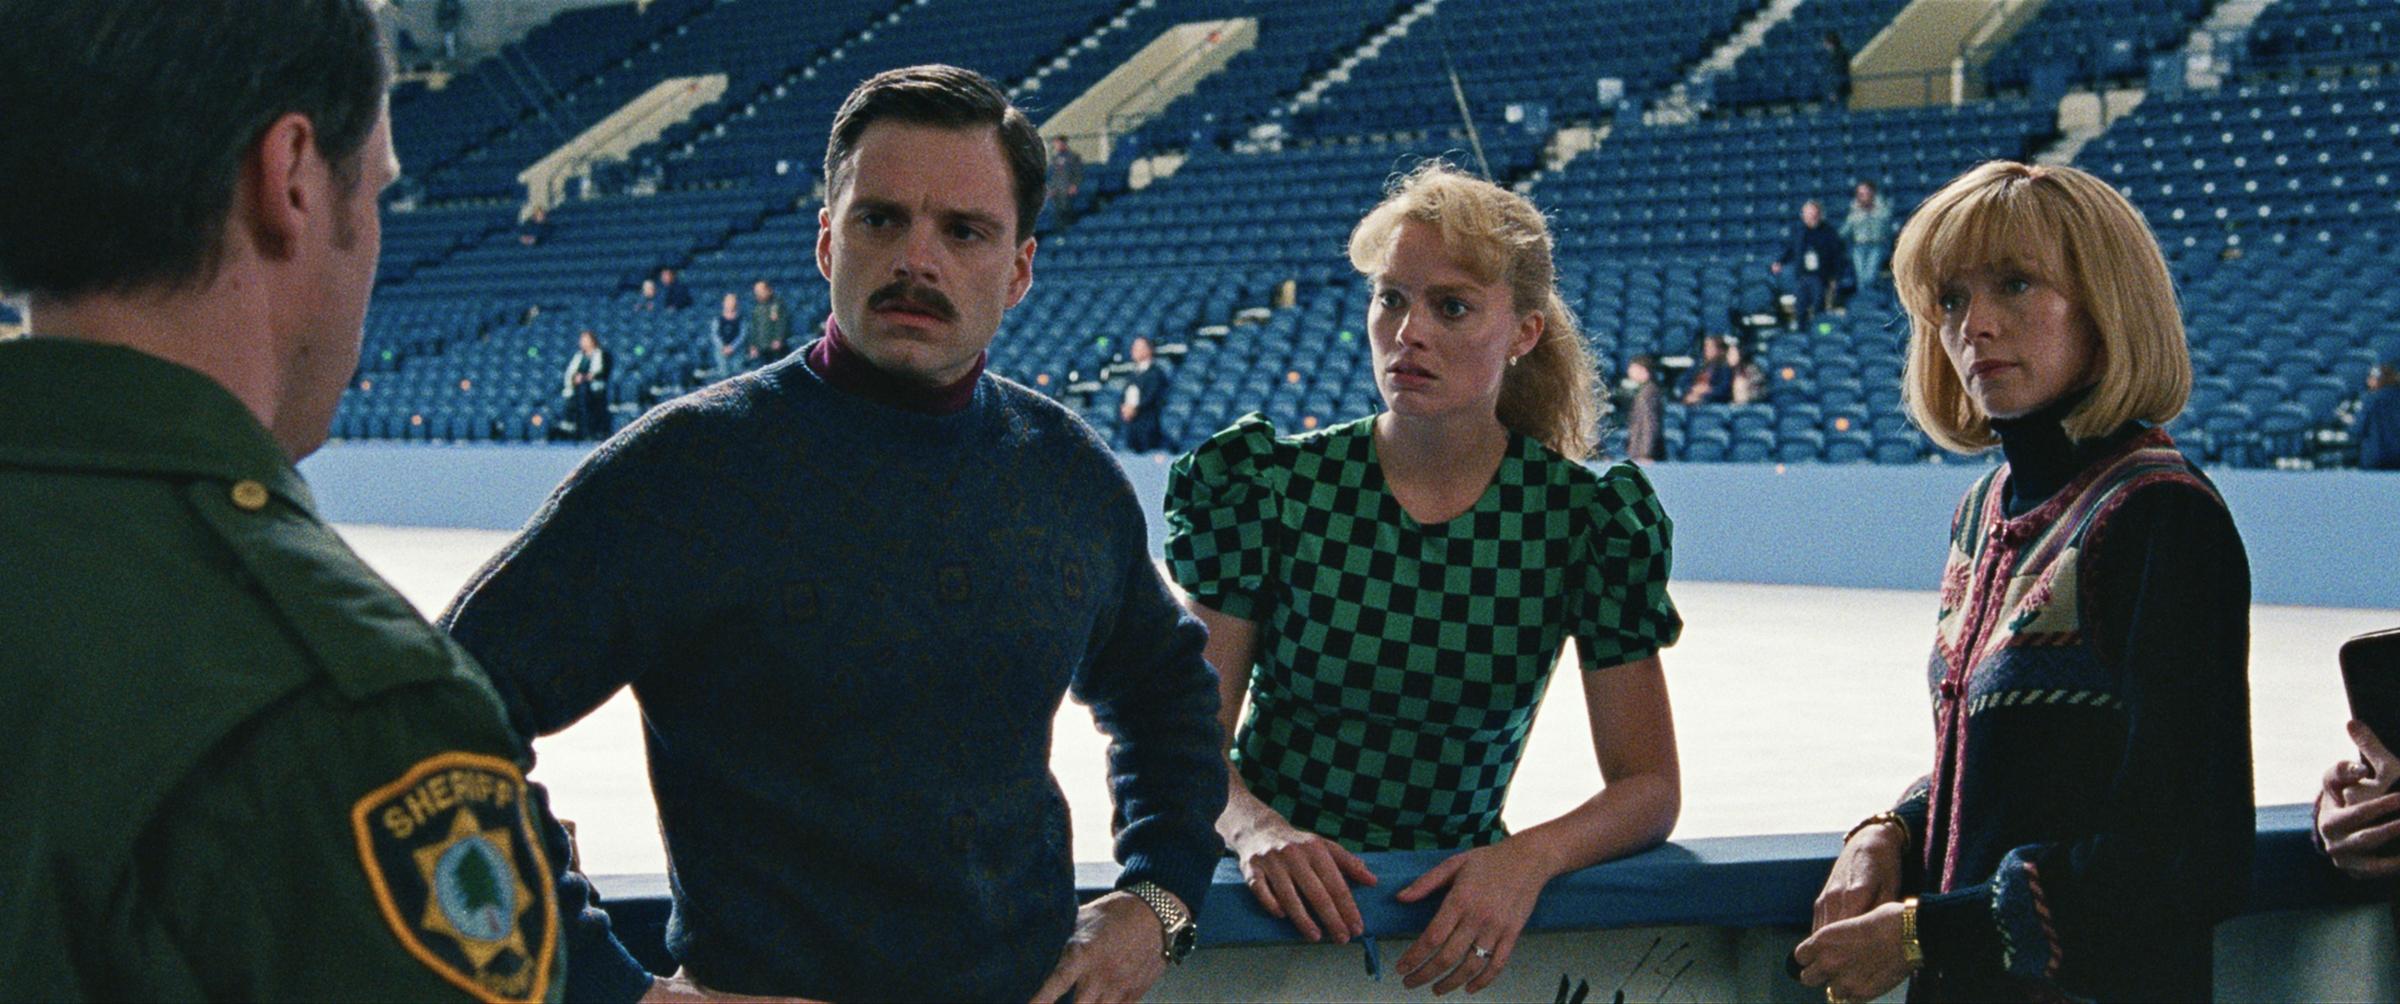 'Yo, Tonya': Tráiler español del biopic de Tonya Harding con Margot Robbie